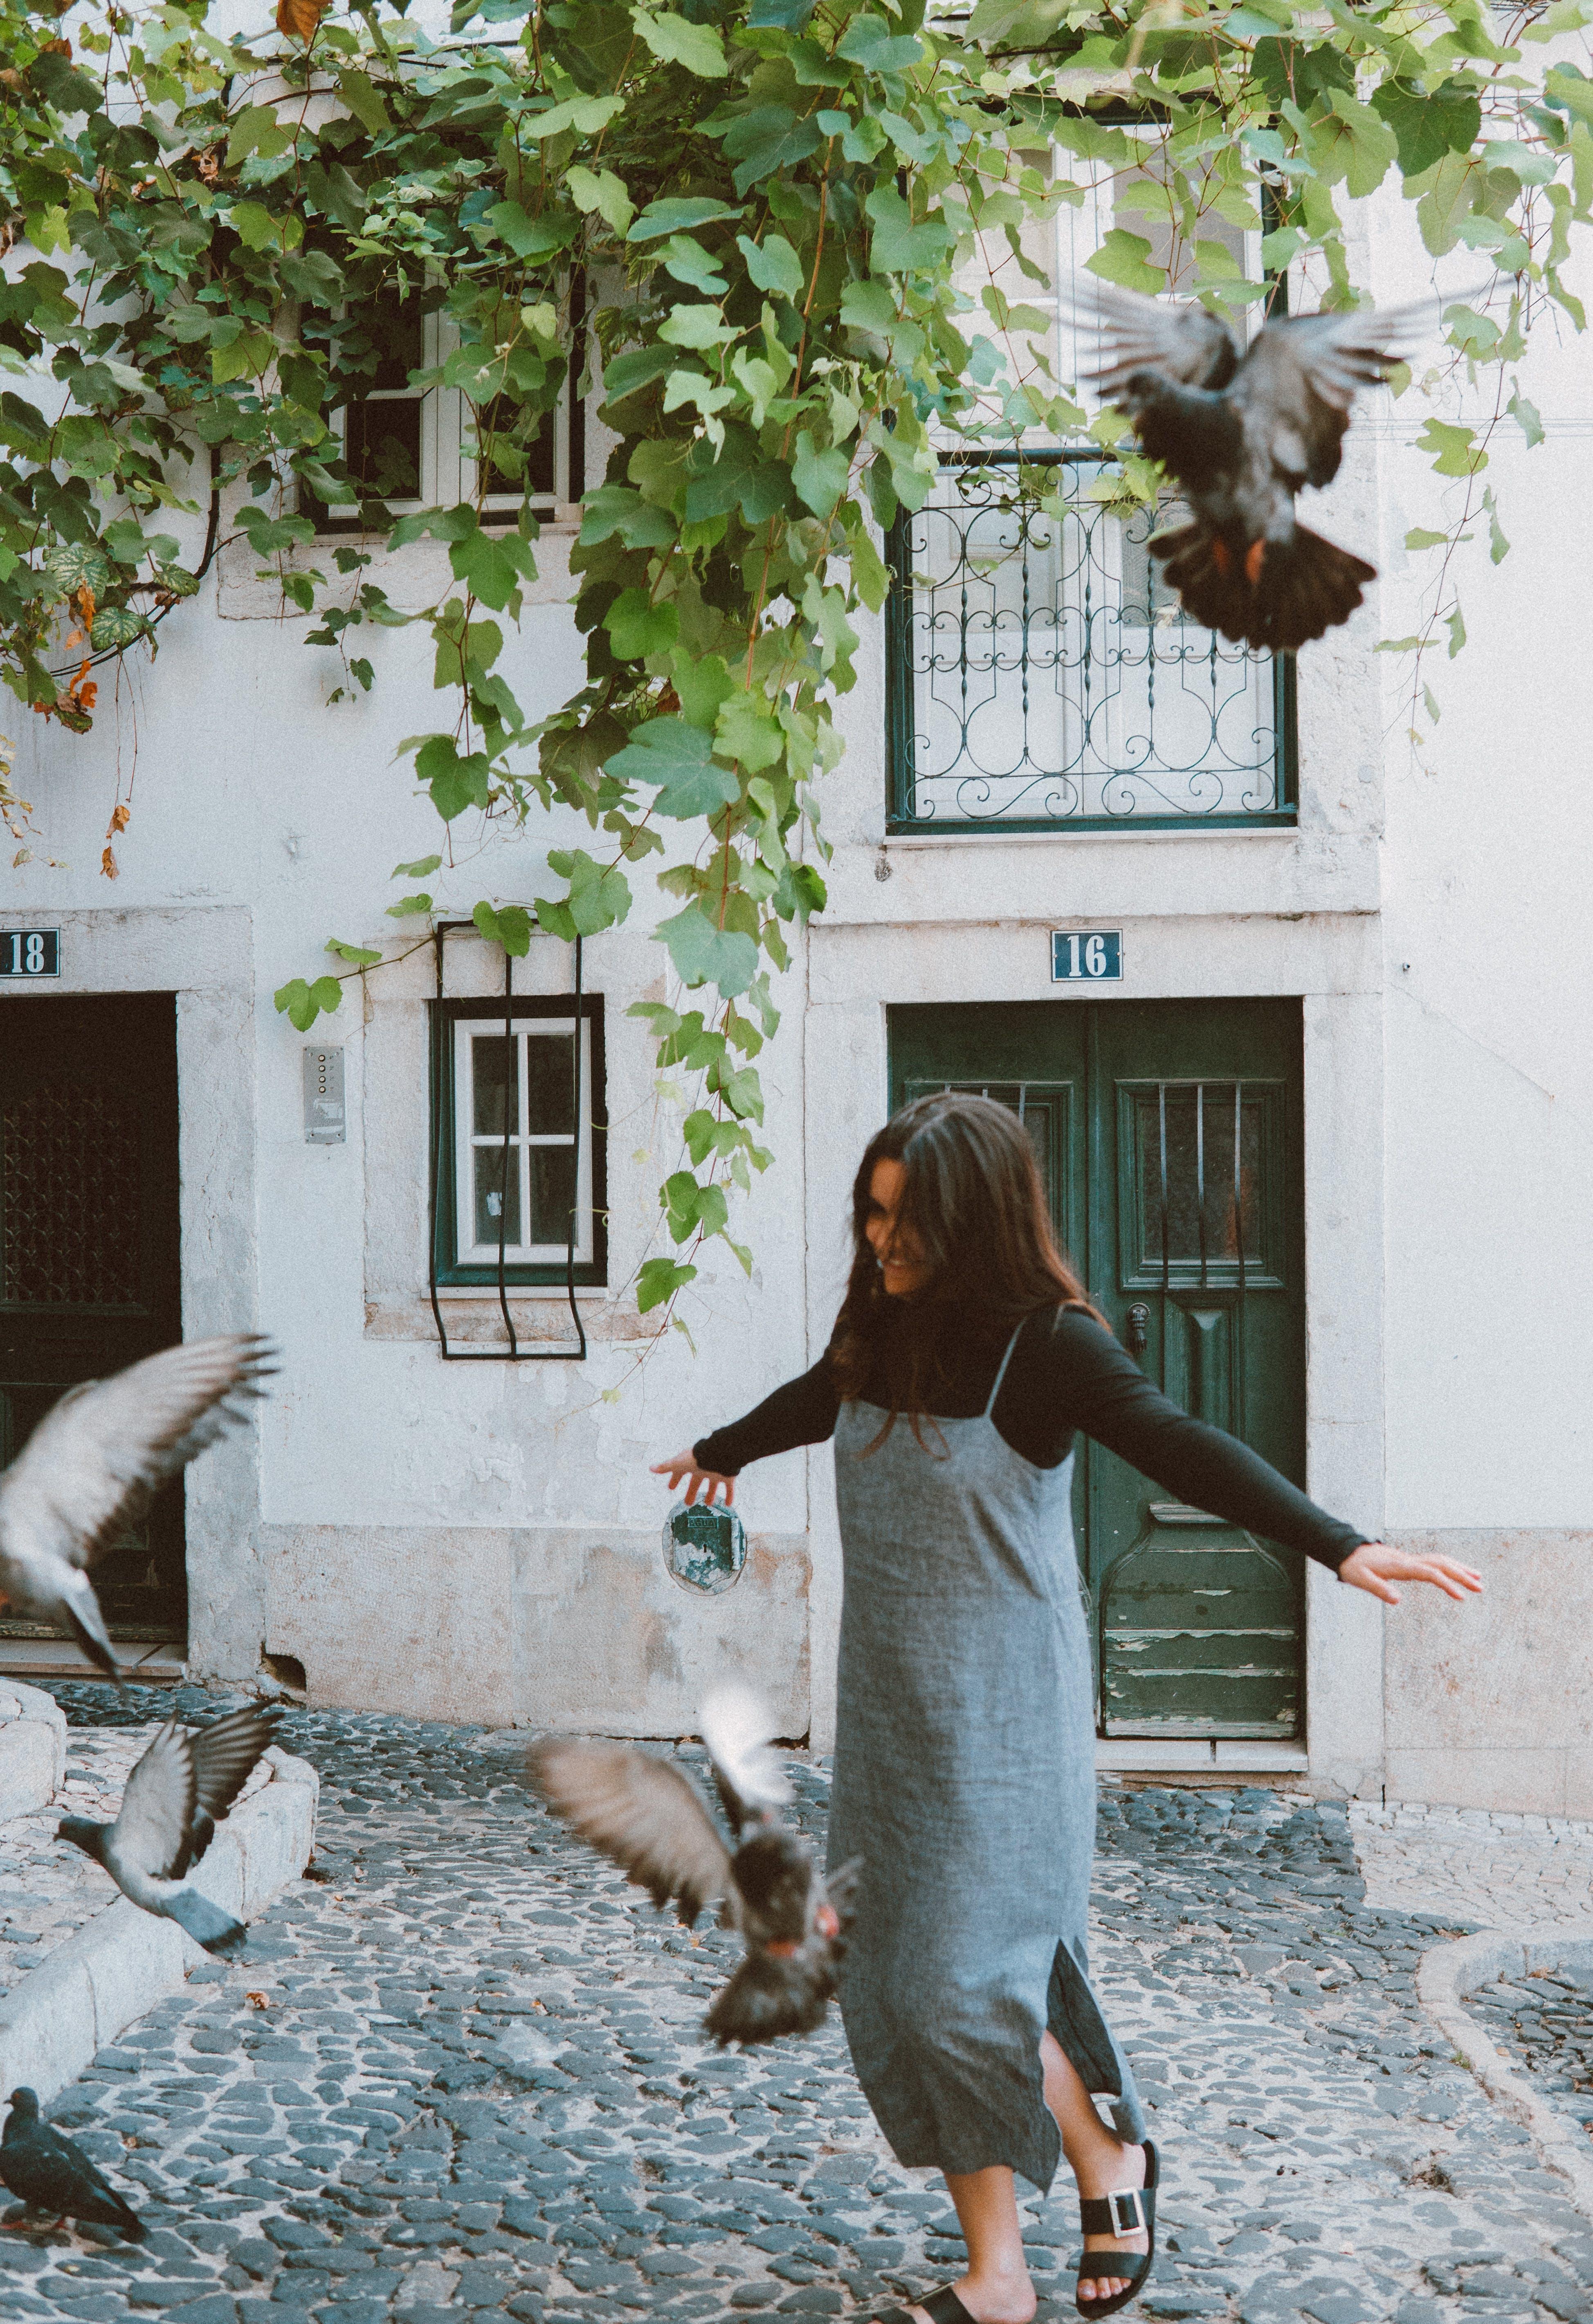 Woman Chasing Flock of Pigeons